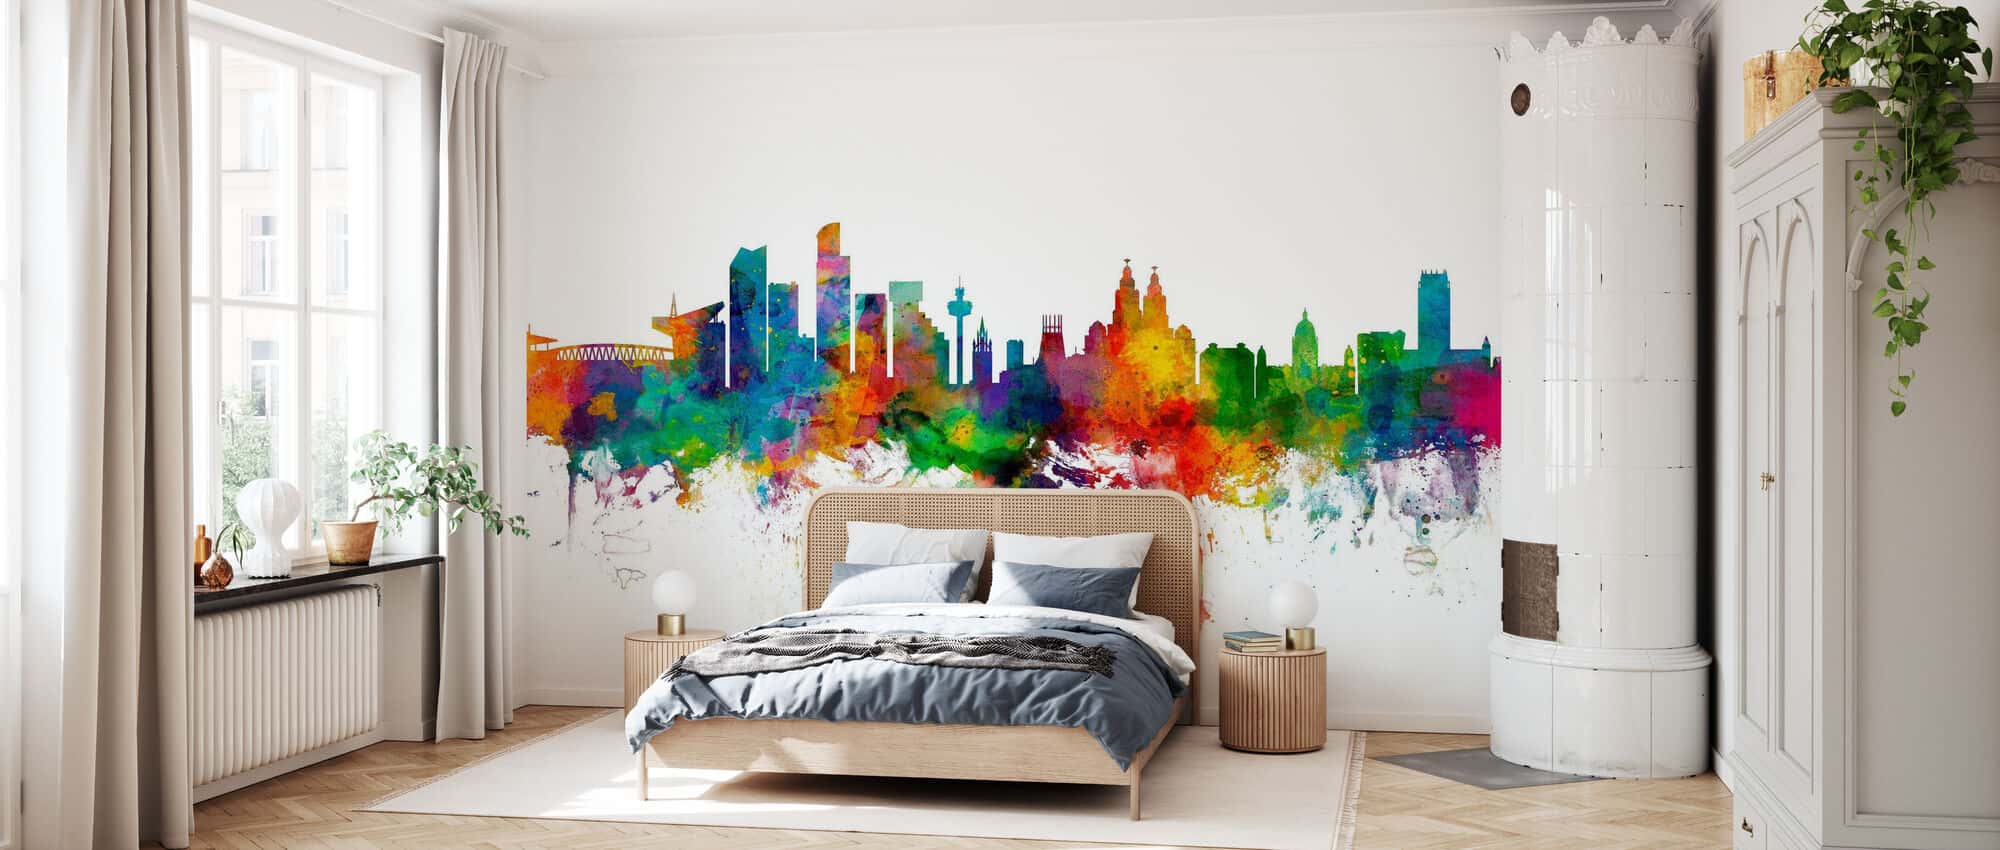 Rainbow City wallpaper